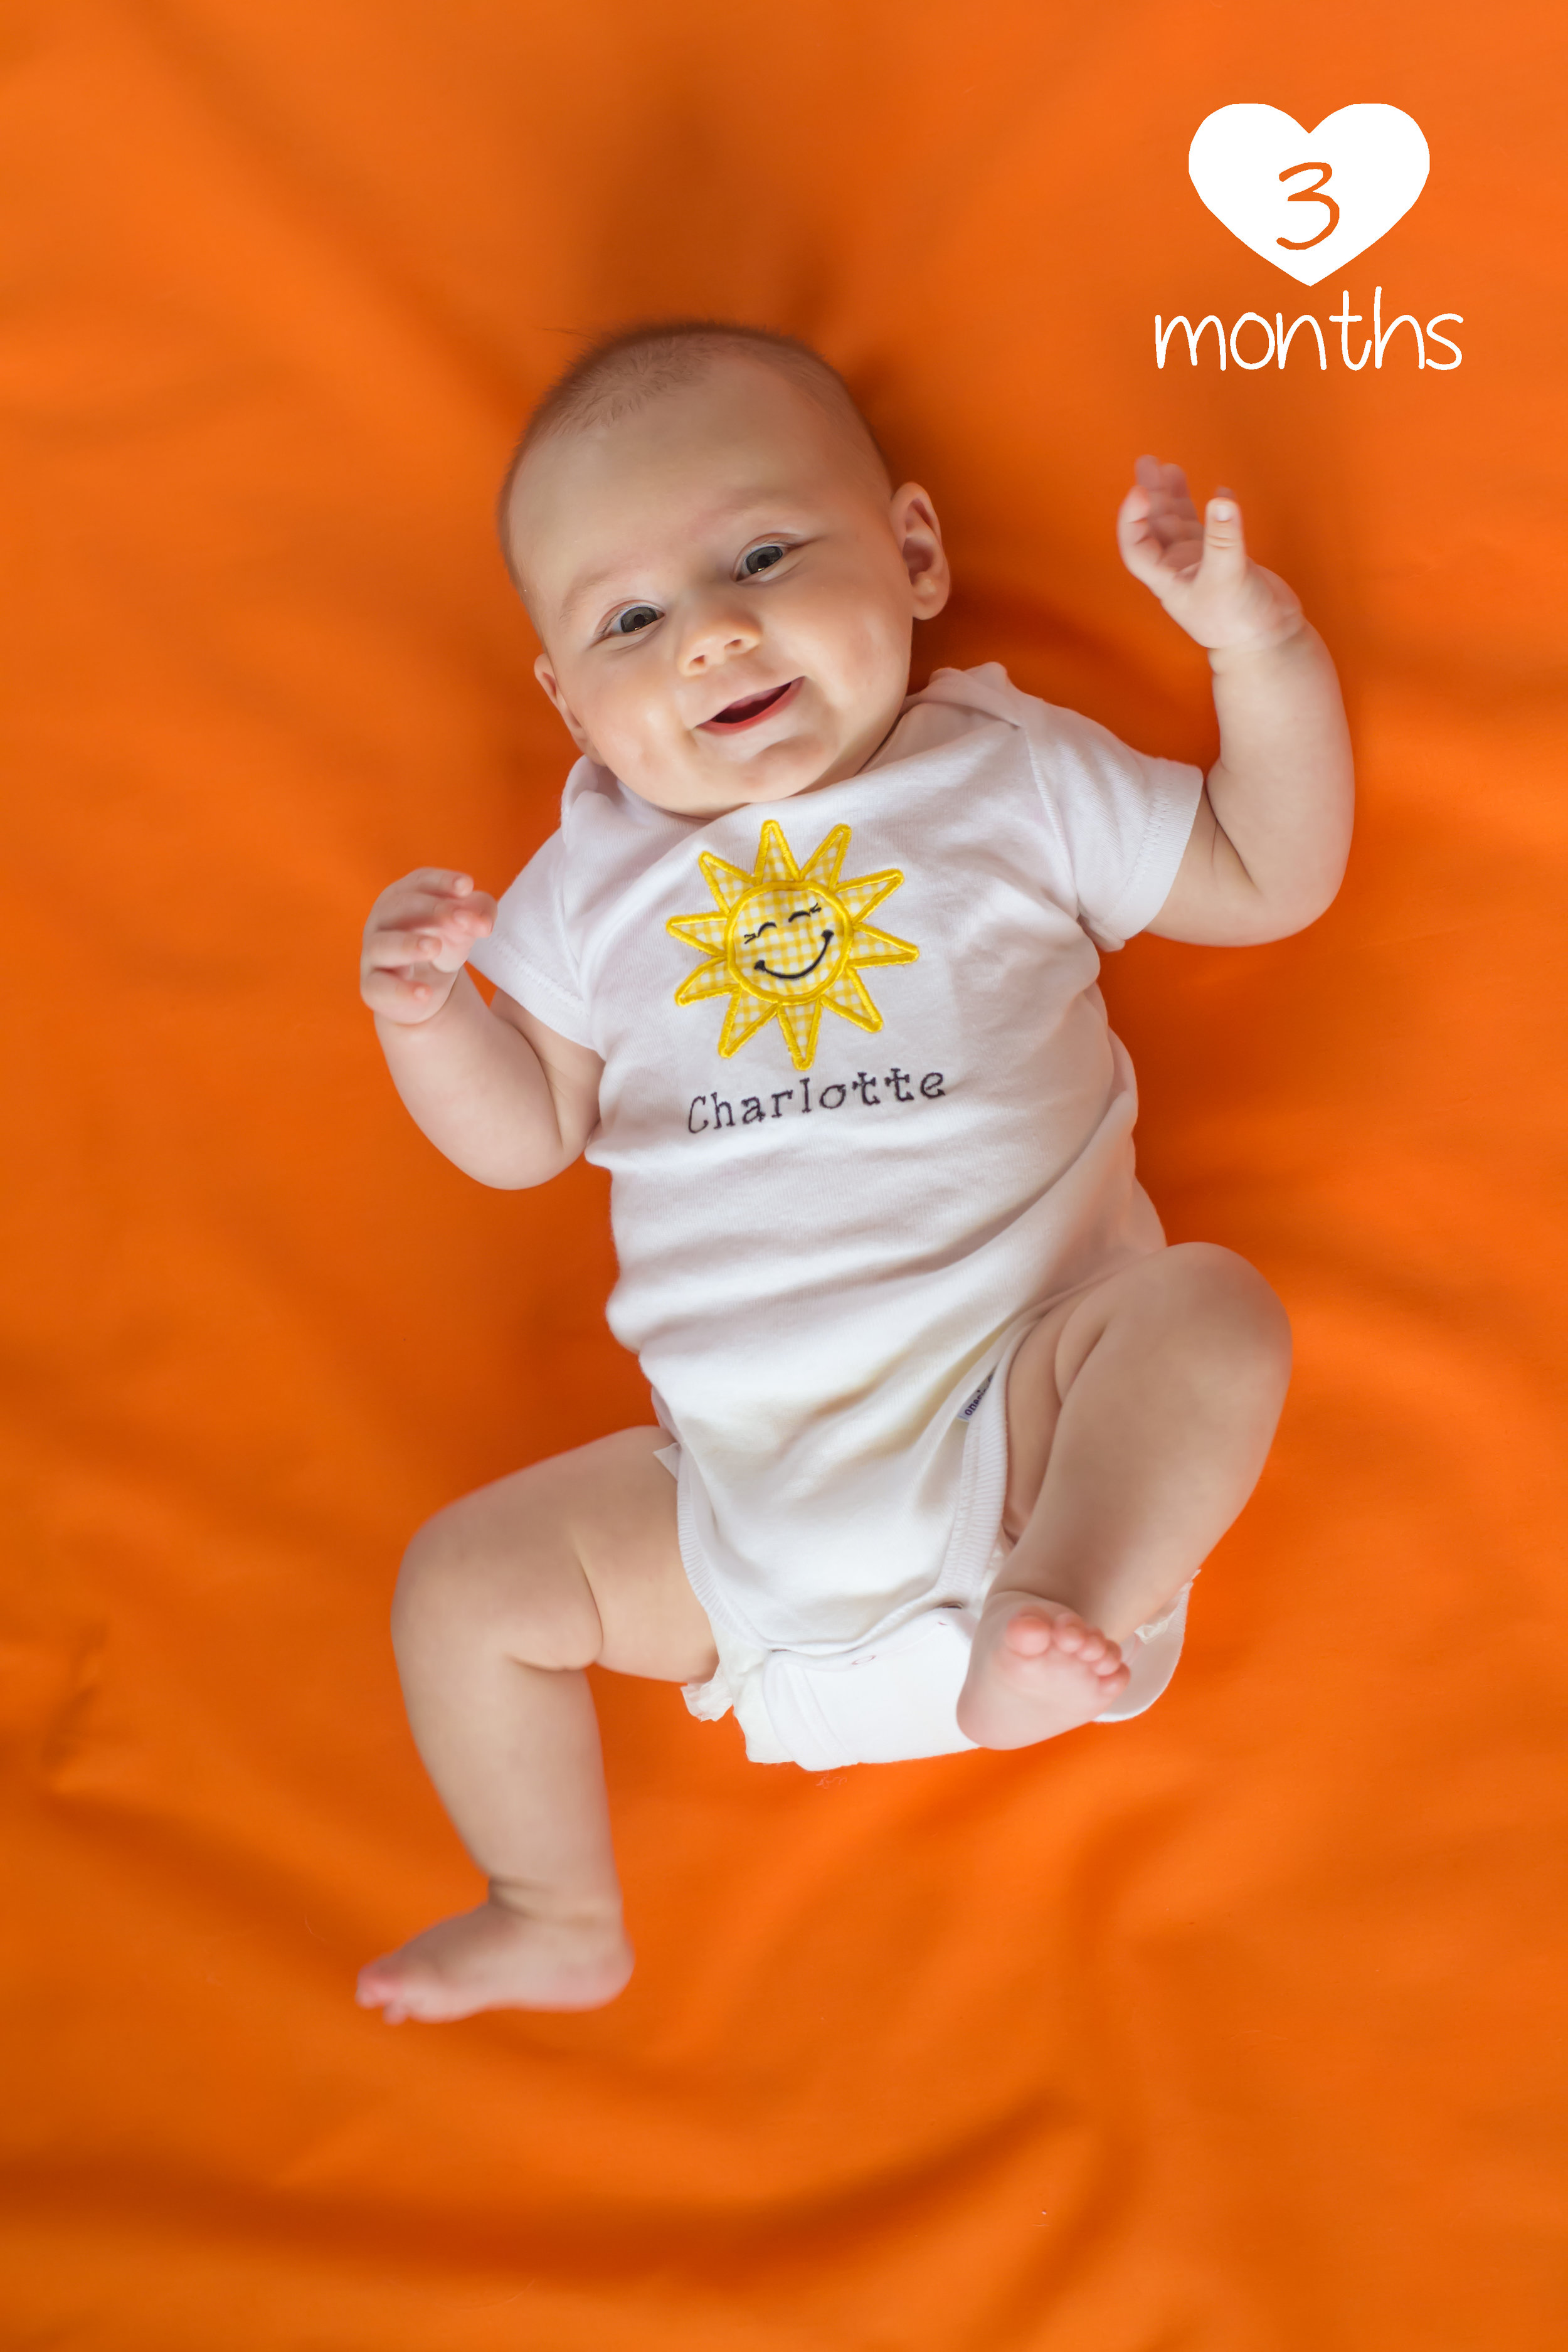 charlotte 3 month